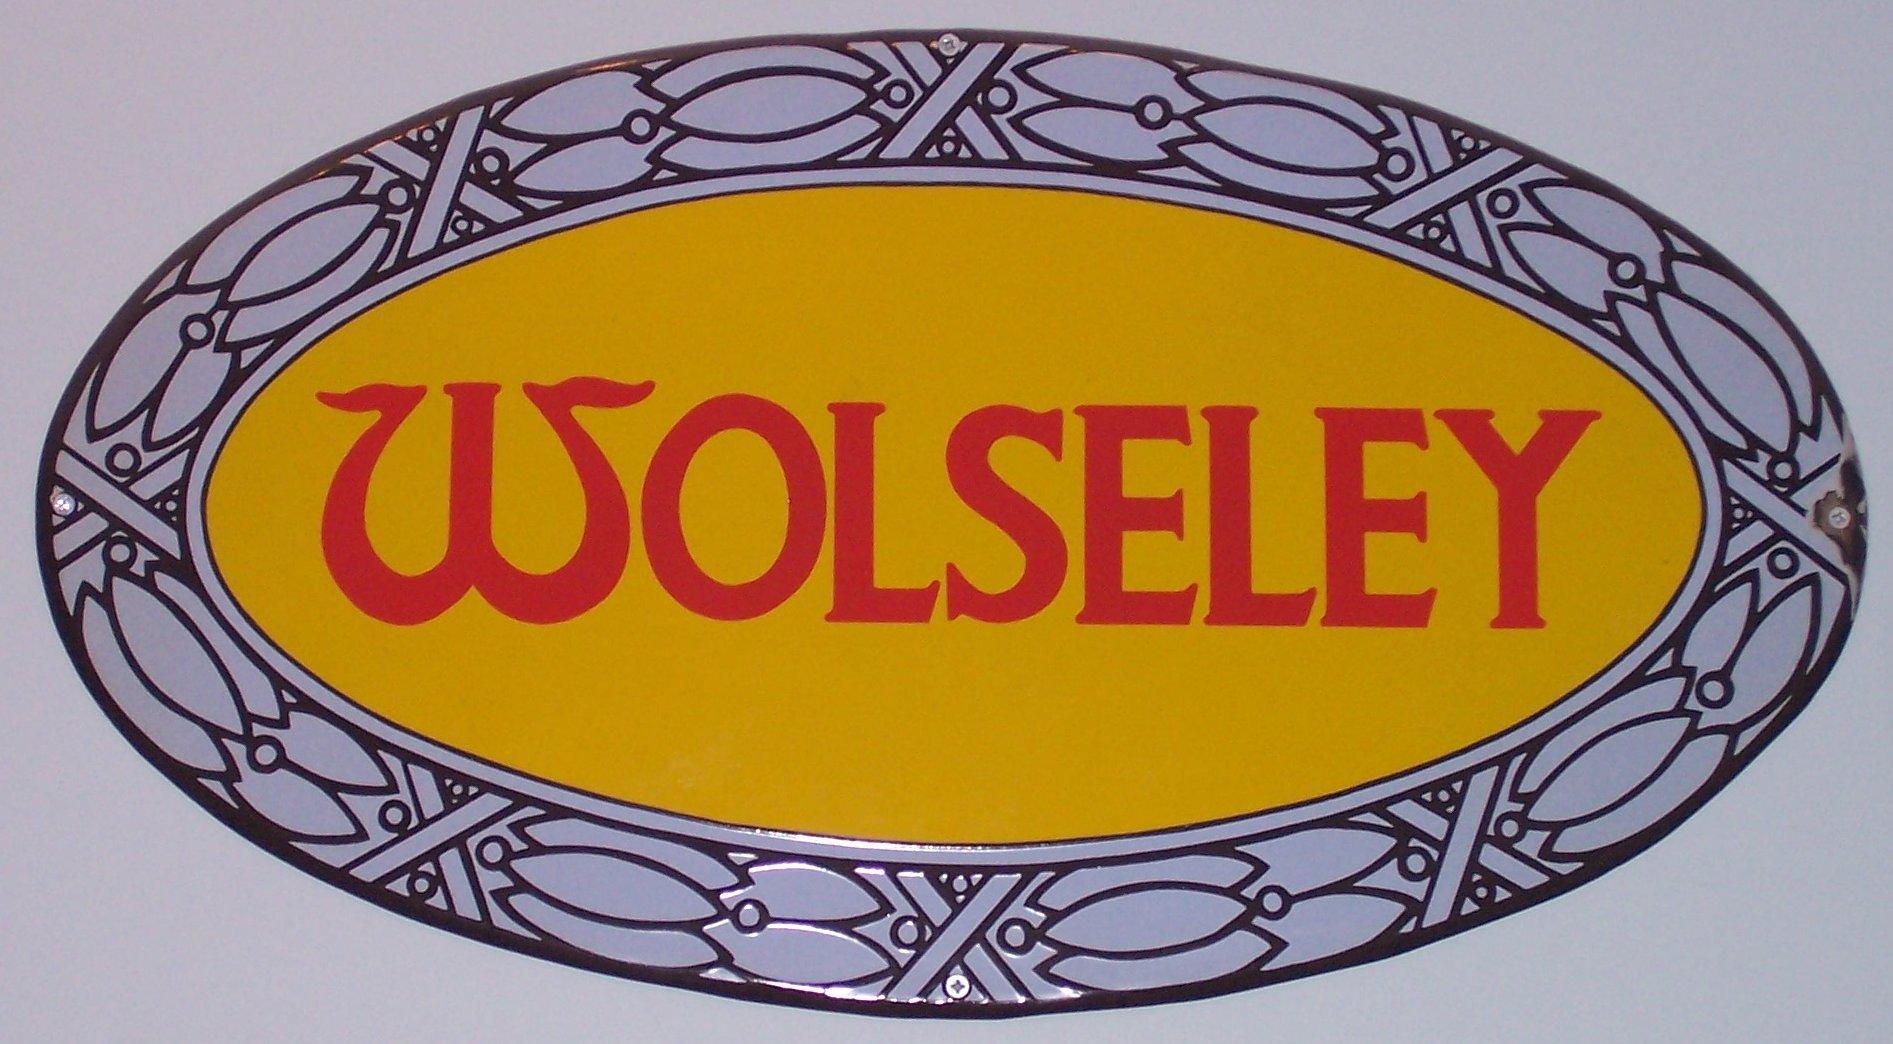 Wolseley Motor Company